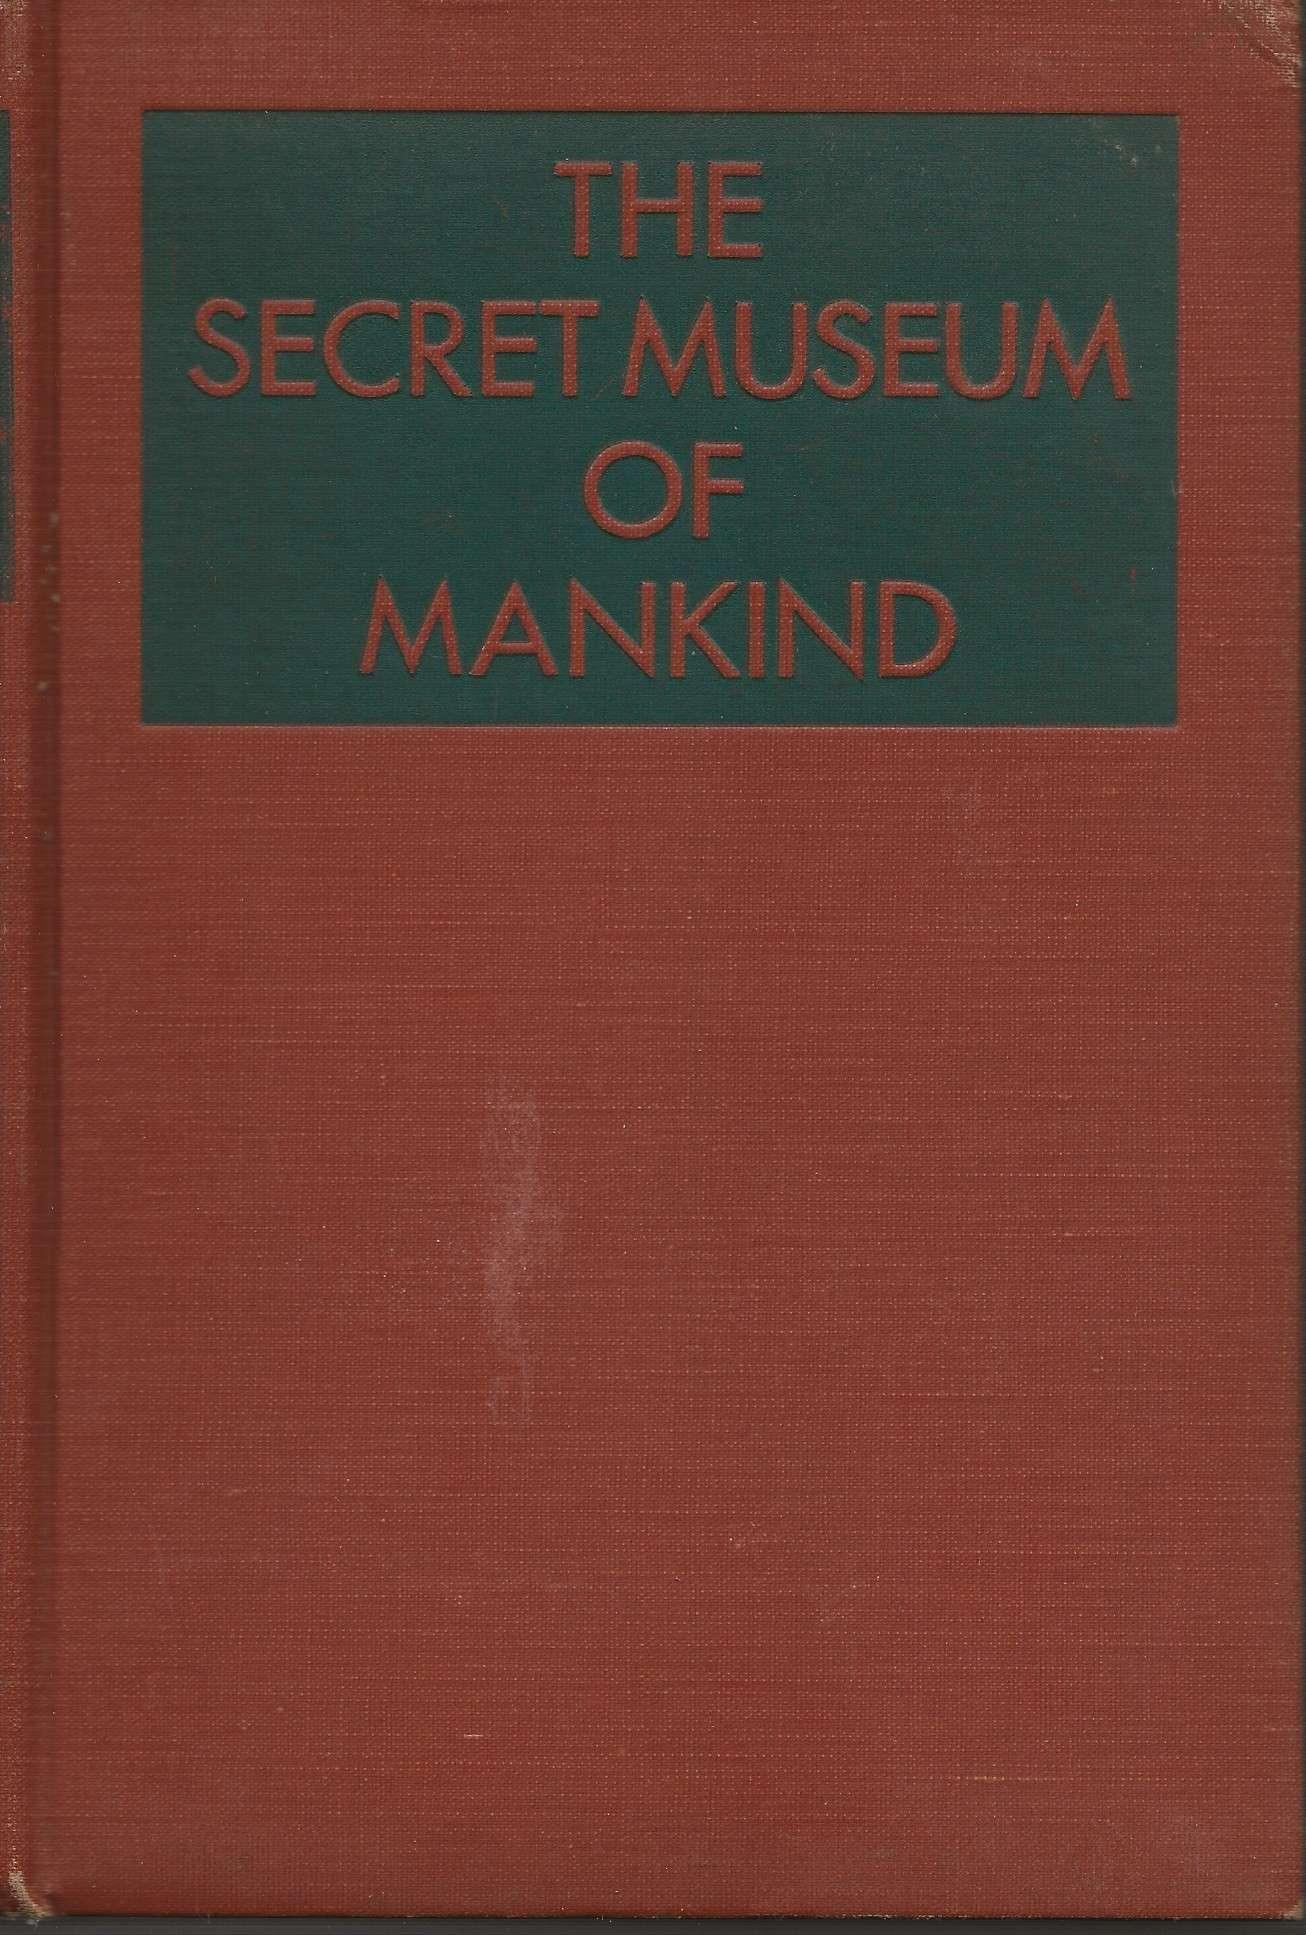 The Secret Museum of Mankind